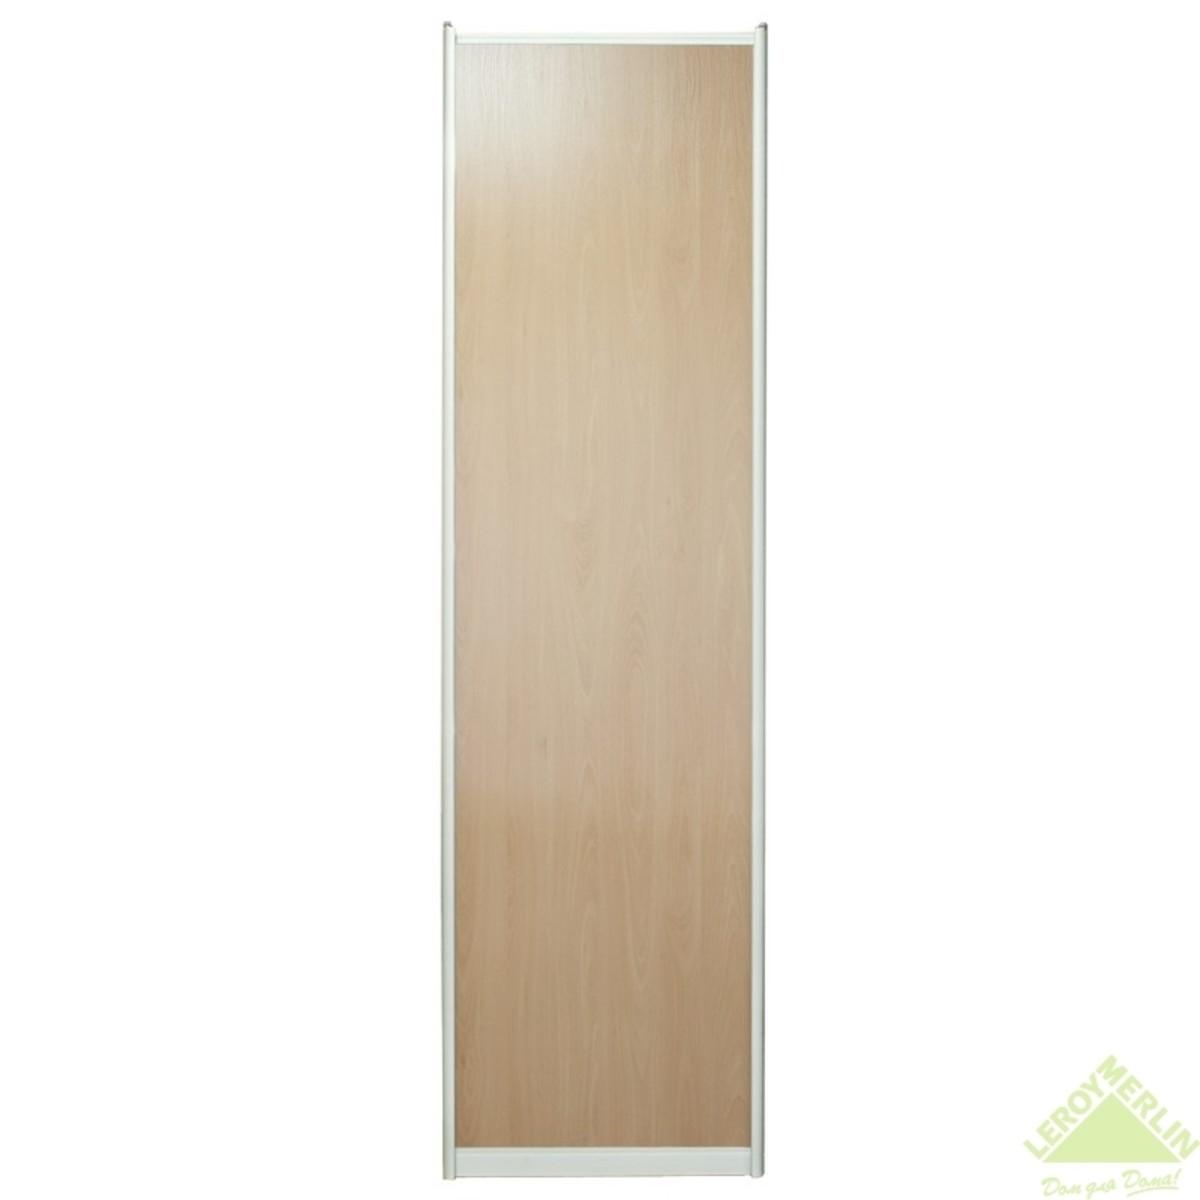 Дверь-купе 2251х804 мм цвет бук/серебро